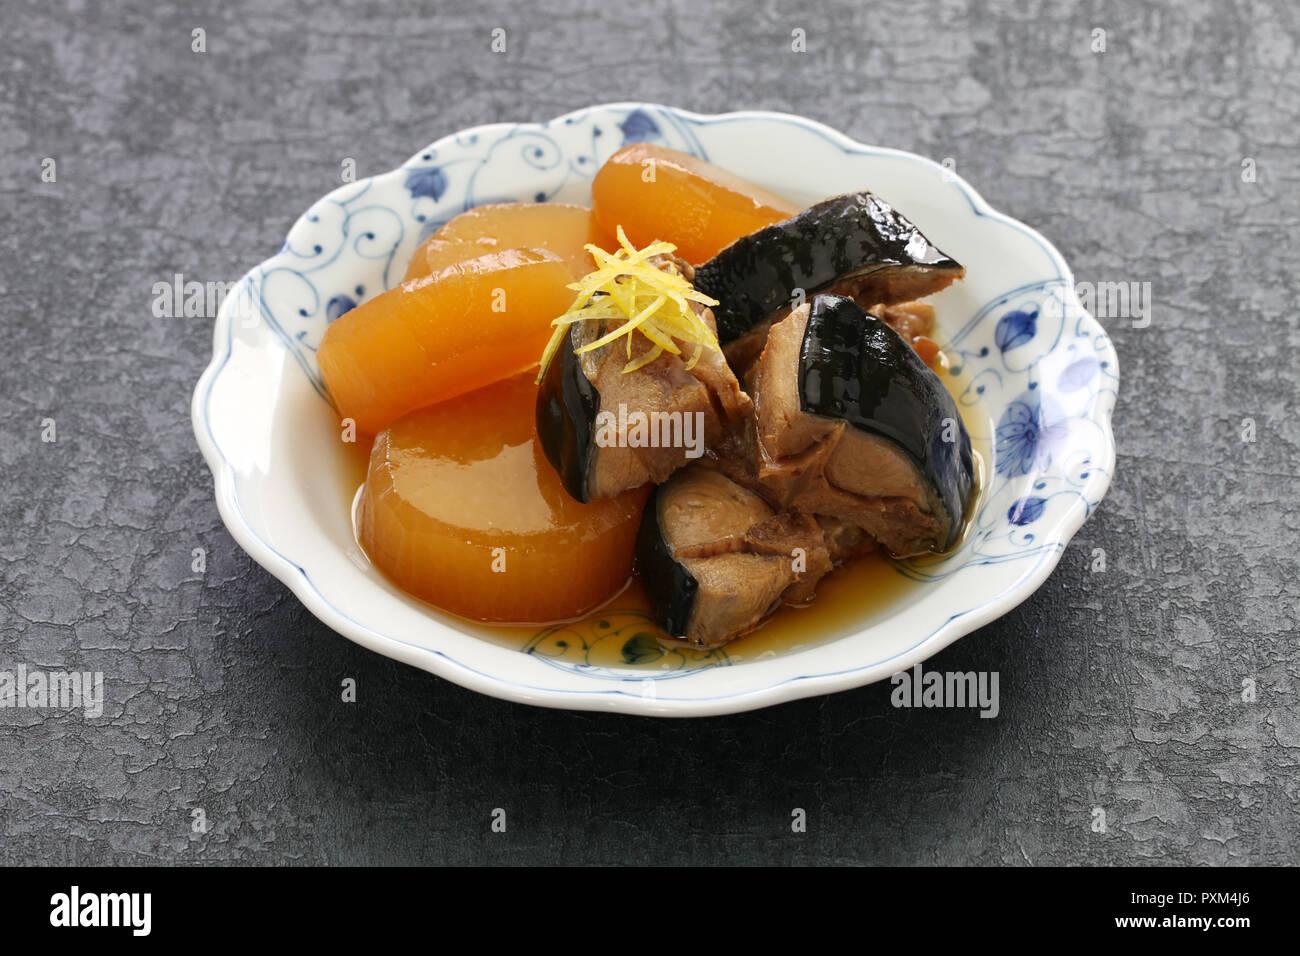 Buri Daikon, Simmered yellowtail fish with japanese radish, popular Japanese dish in the winter. - Stock Image